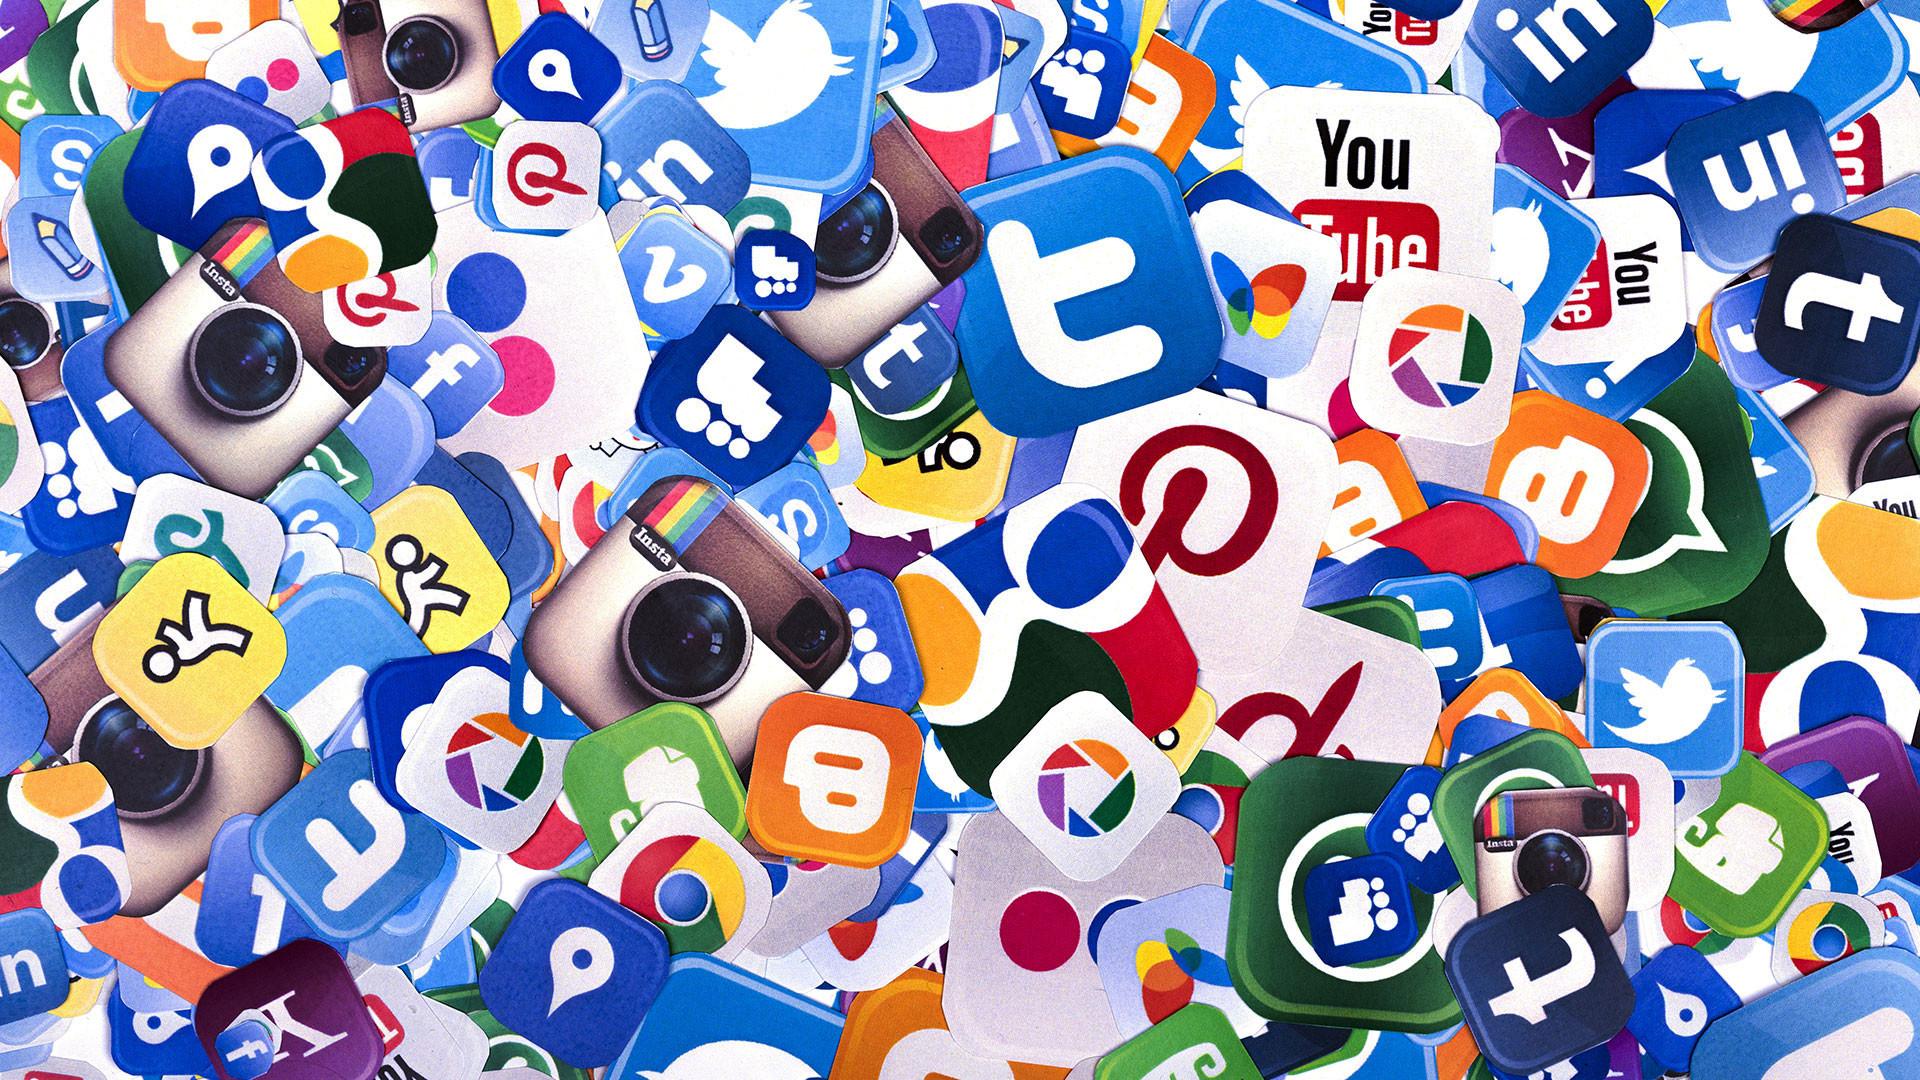 hd pics photos stunning attractive social media 19 hd desktop background  wallpaper